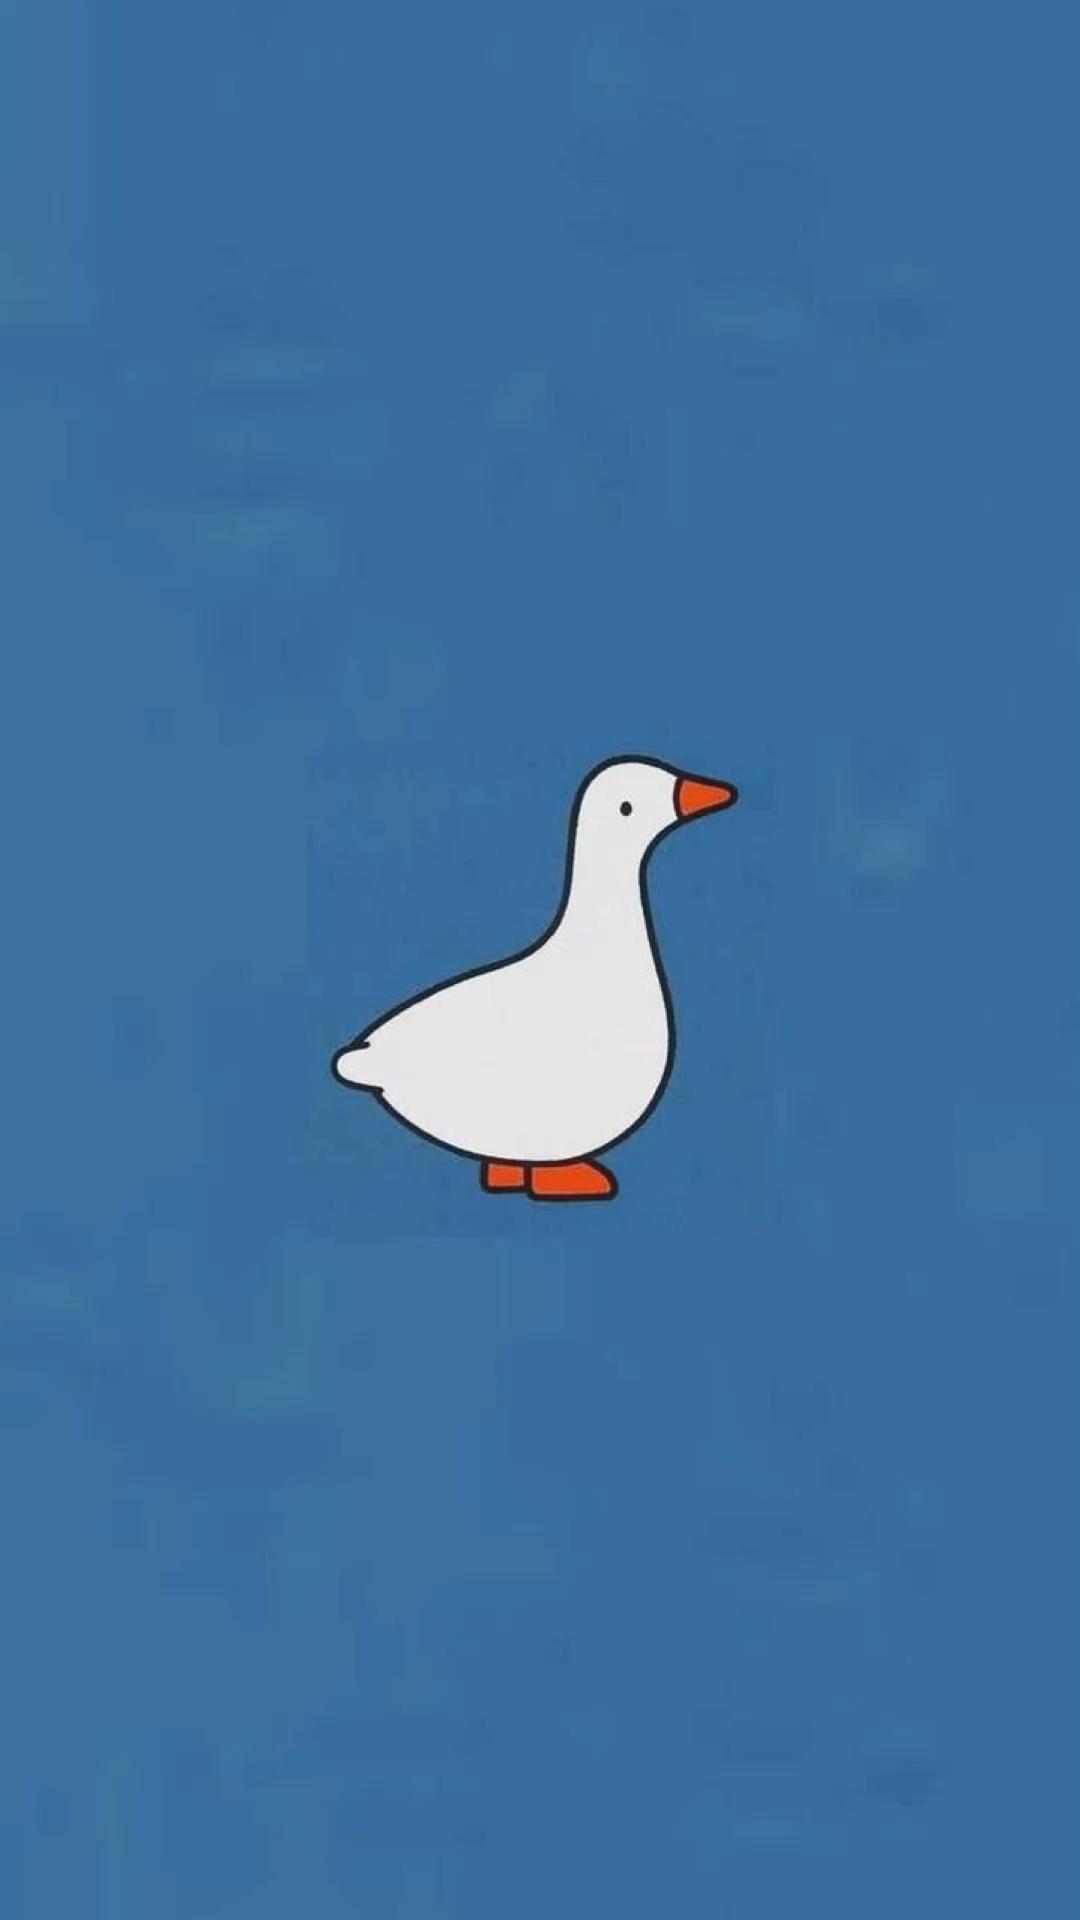 Fashion goose